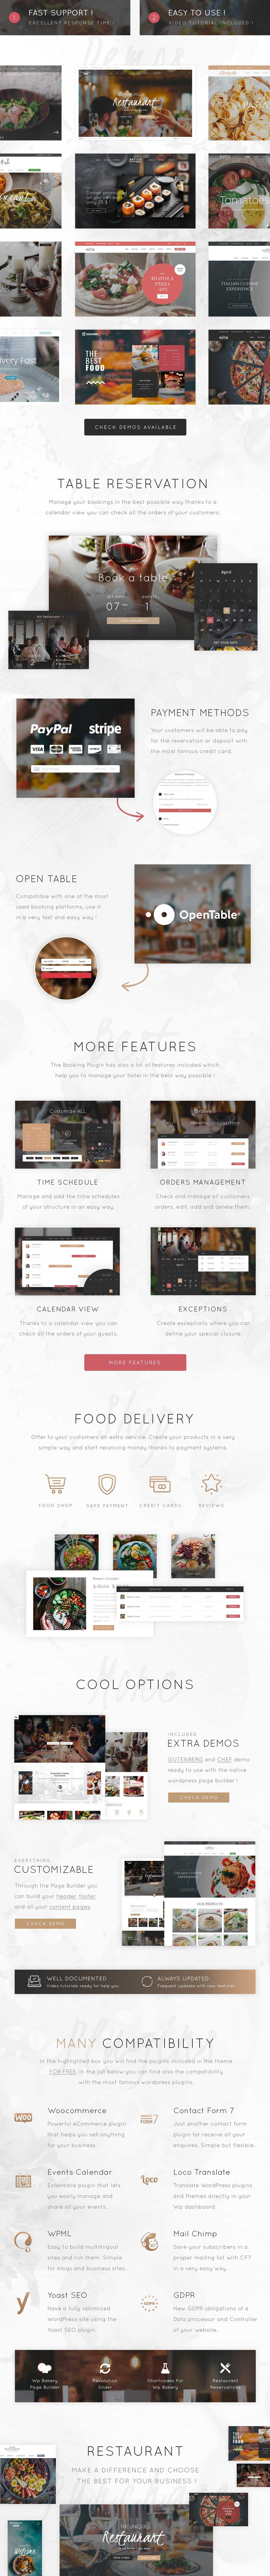 Ristorante - Restaurant WordPress Theme - 1